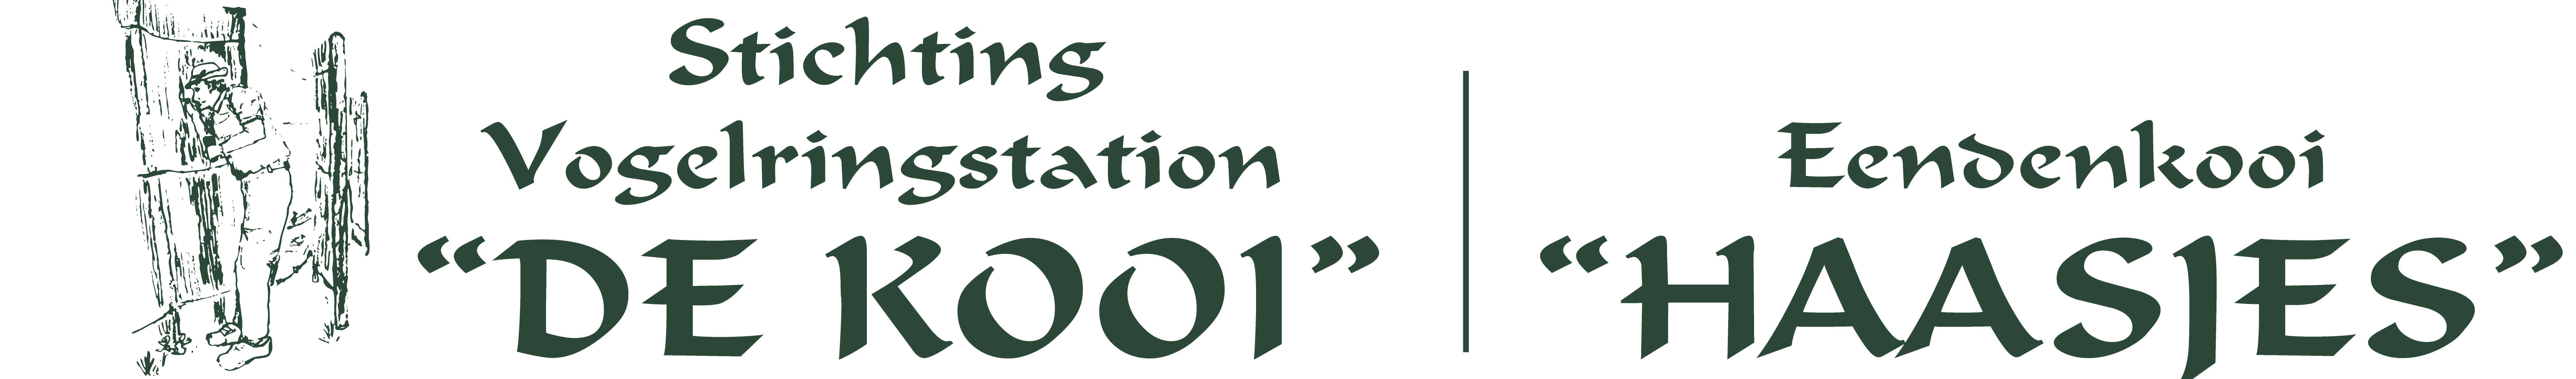 Stichting vogelringstation 'De Kooi'